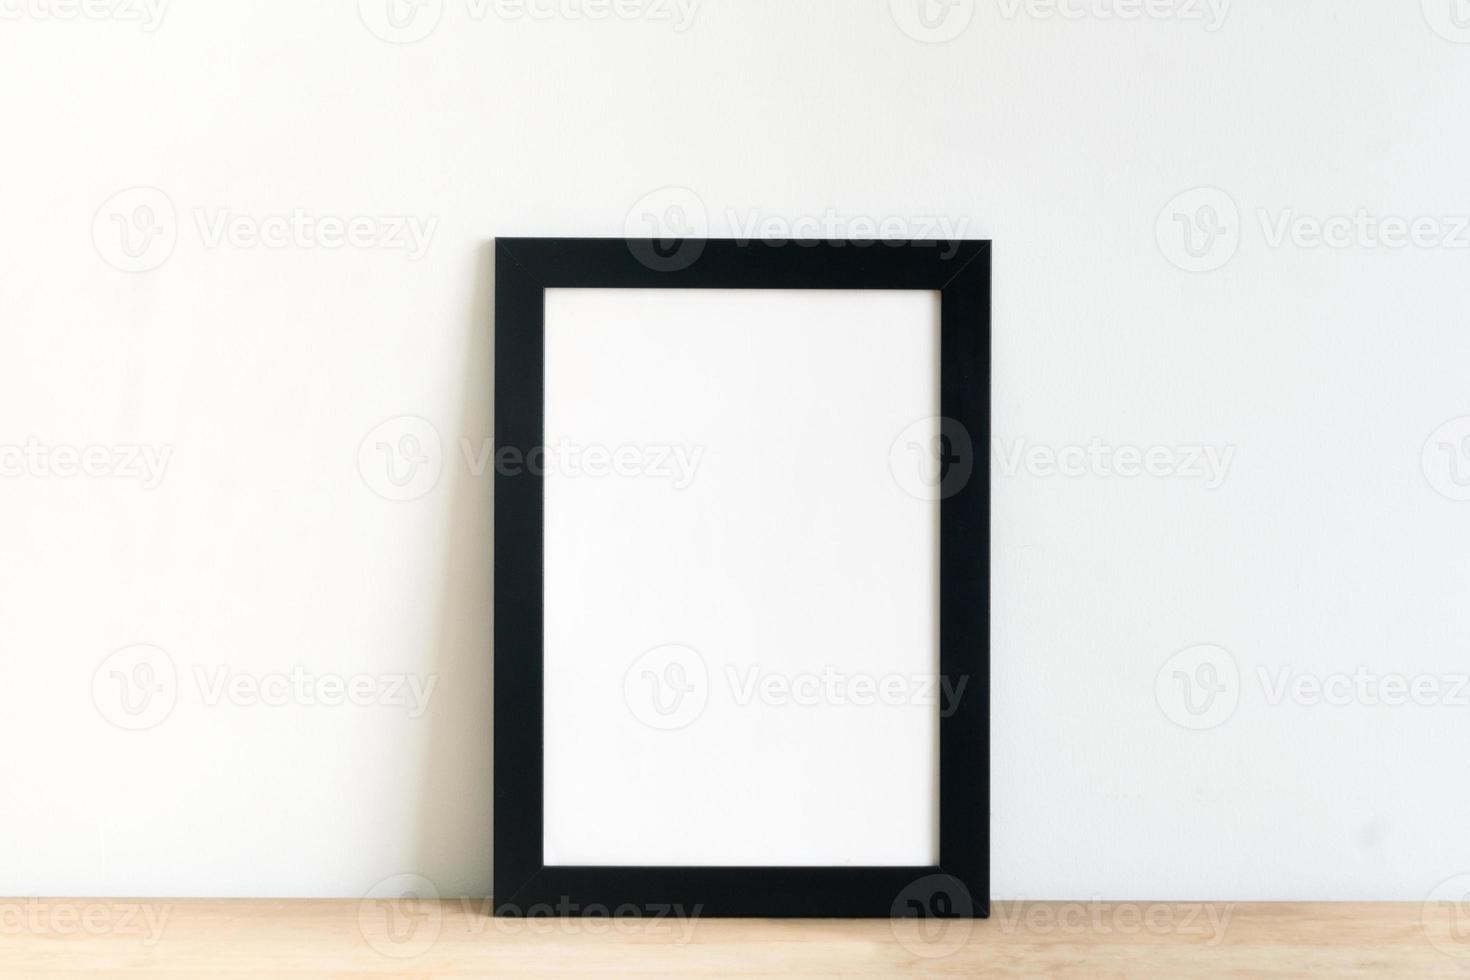 tom svart bildram på den vita inre bakgrunden foto